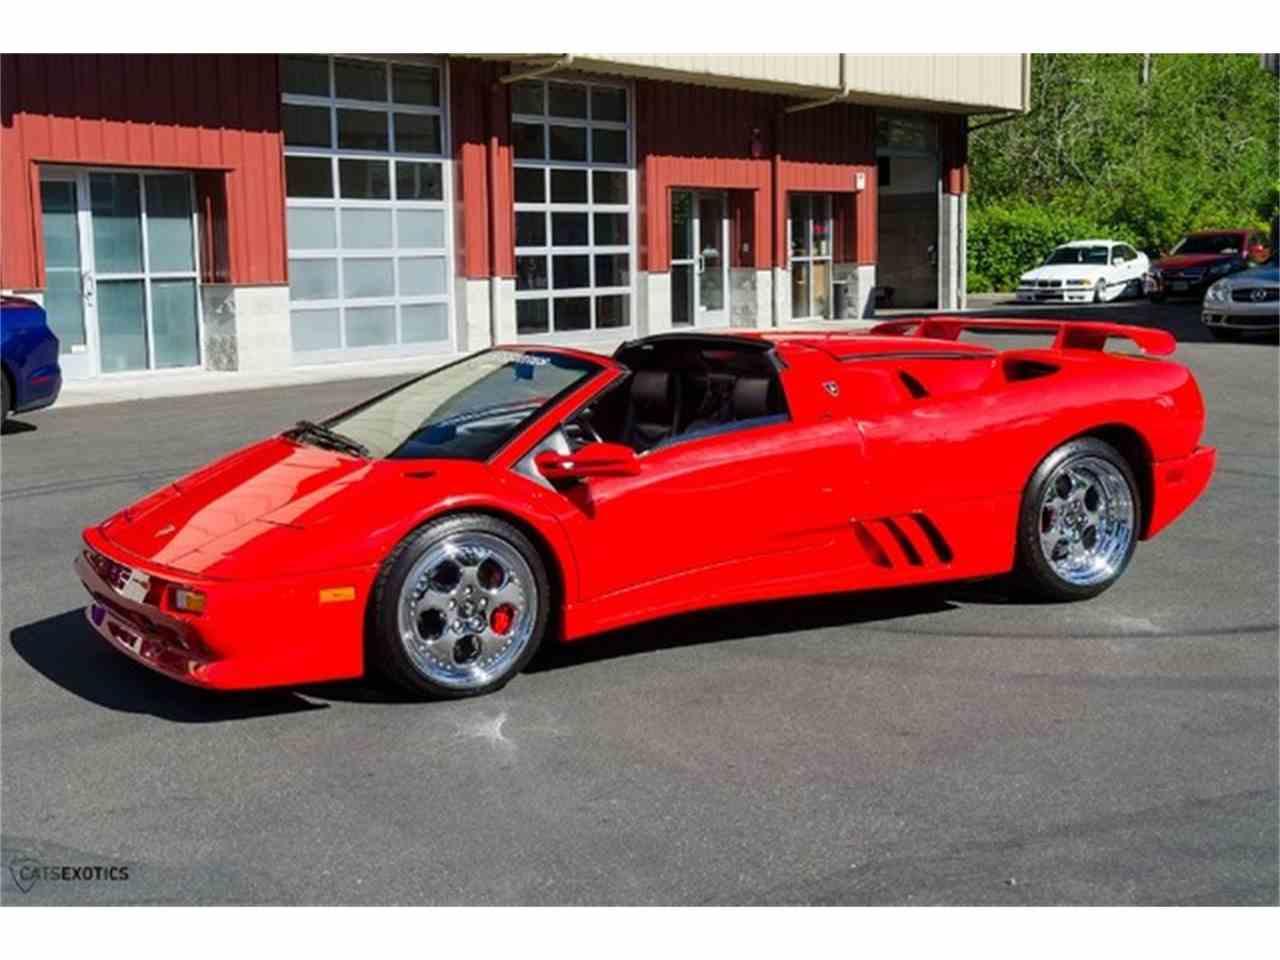 1998 Lamborghini Diablo For Sale Classiccars Com Cc 839188